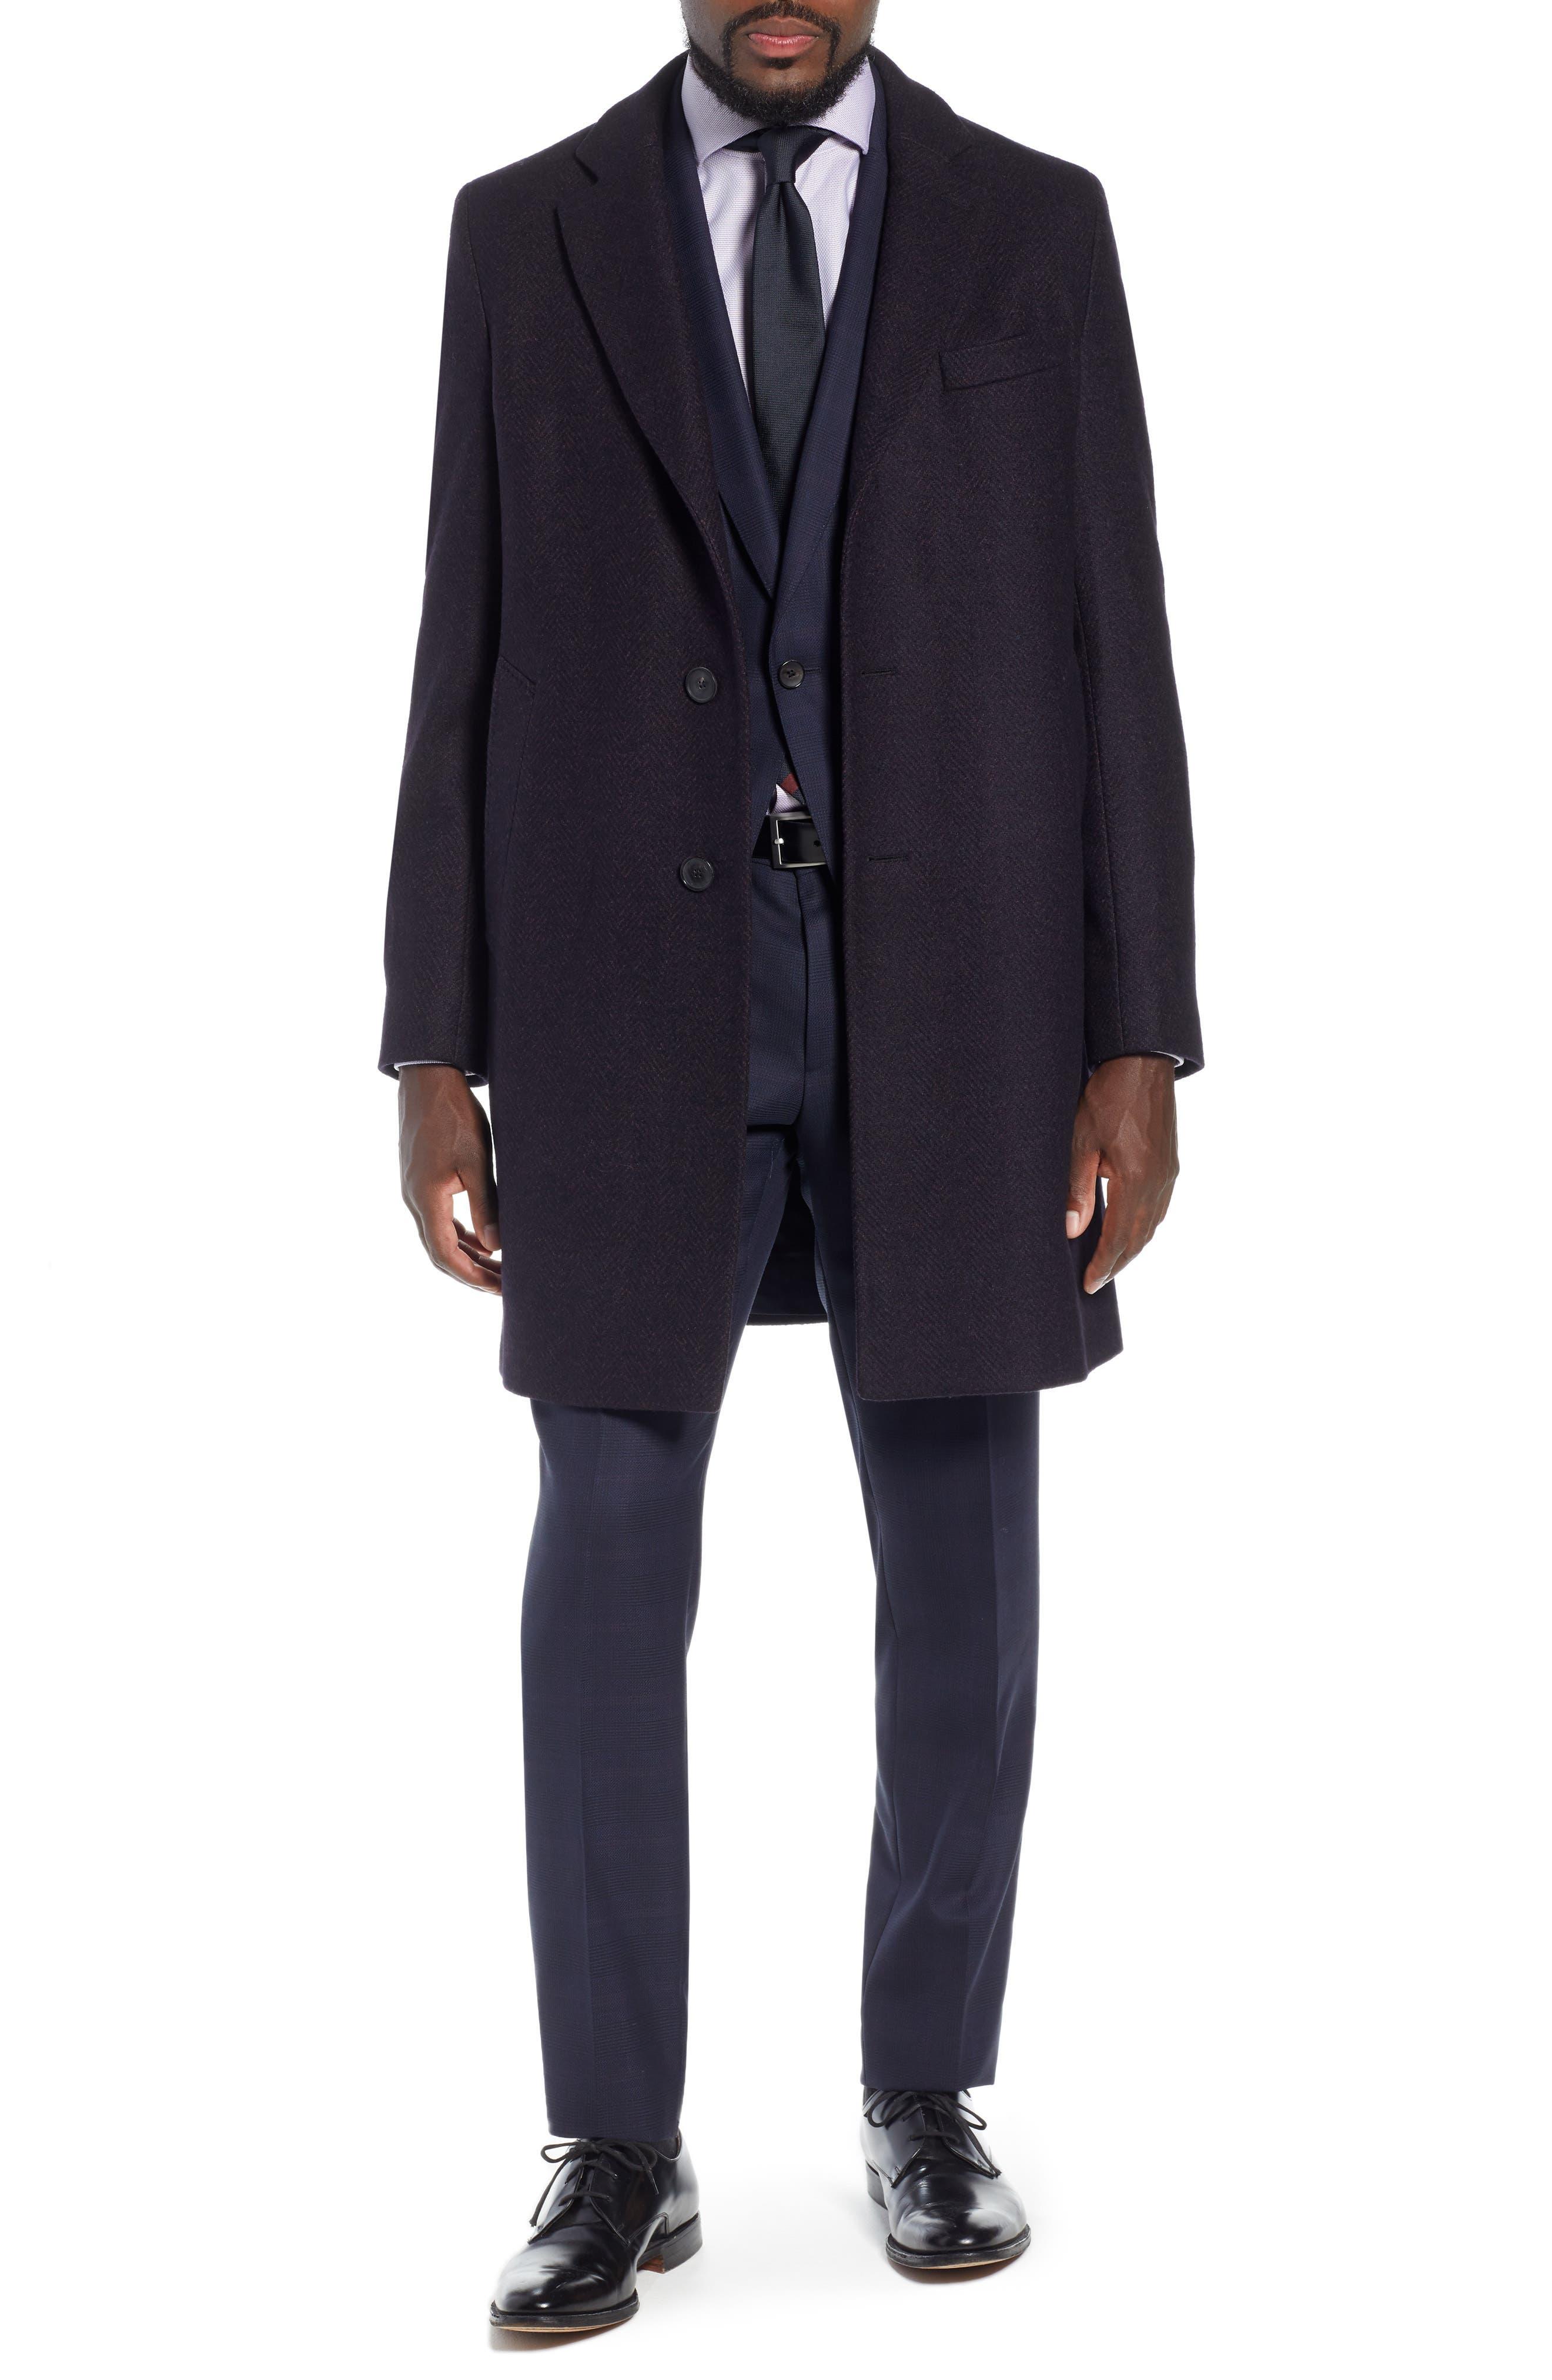 x Nordstrom Huge/Genius Trim Fit Plaid Wool Suit,                             Alternate thumbnail 11, color,                             NAVY